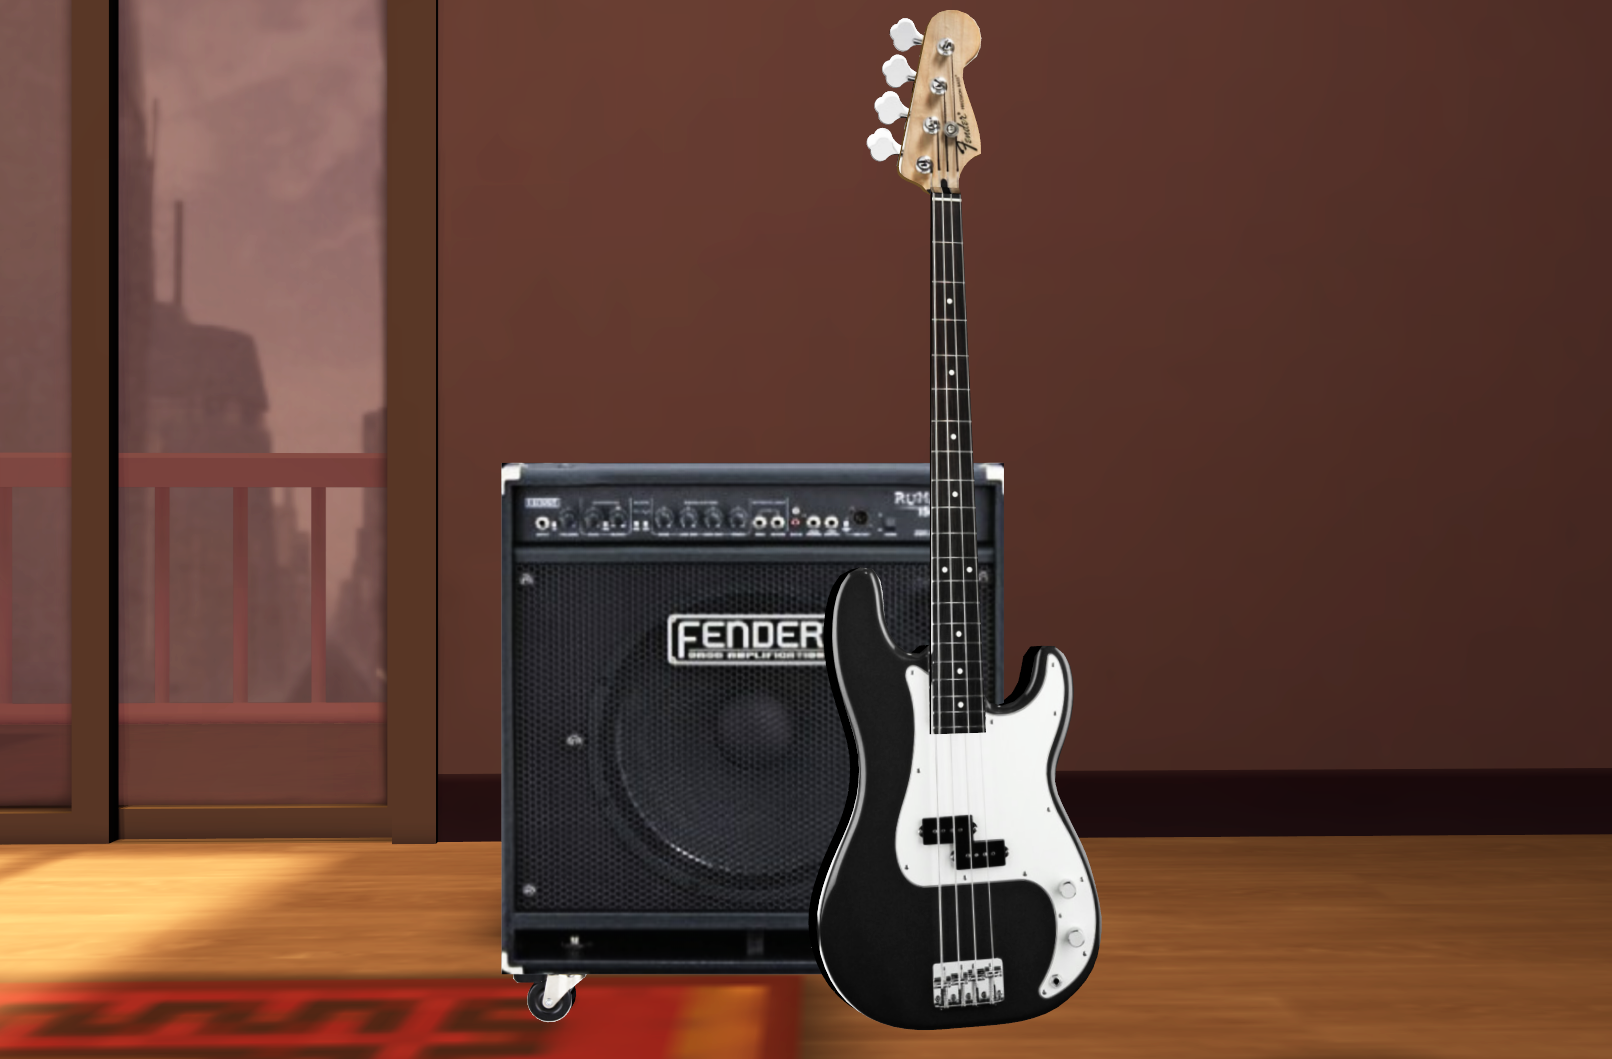 mmd bass guitar and amp dl by onimau619 on deviantart. Black Bedroom Furniture Sets. Home Design Ideas